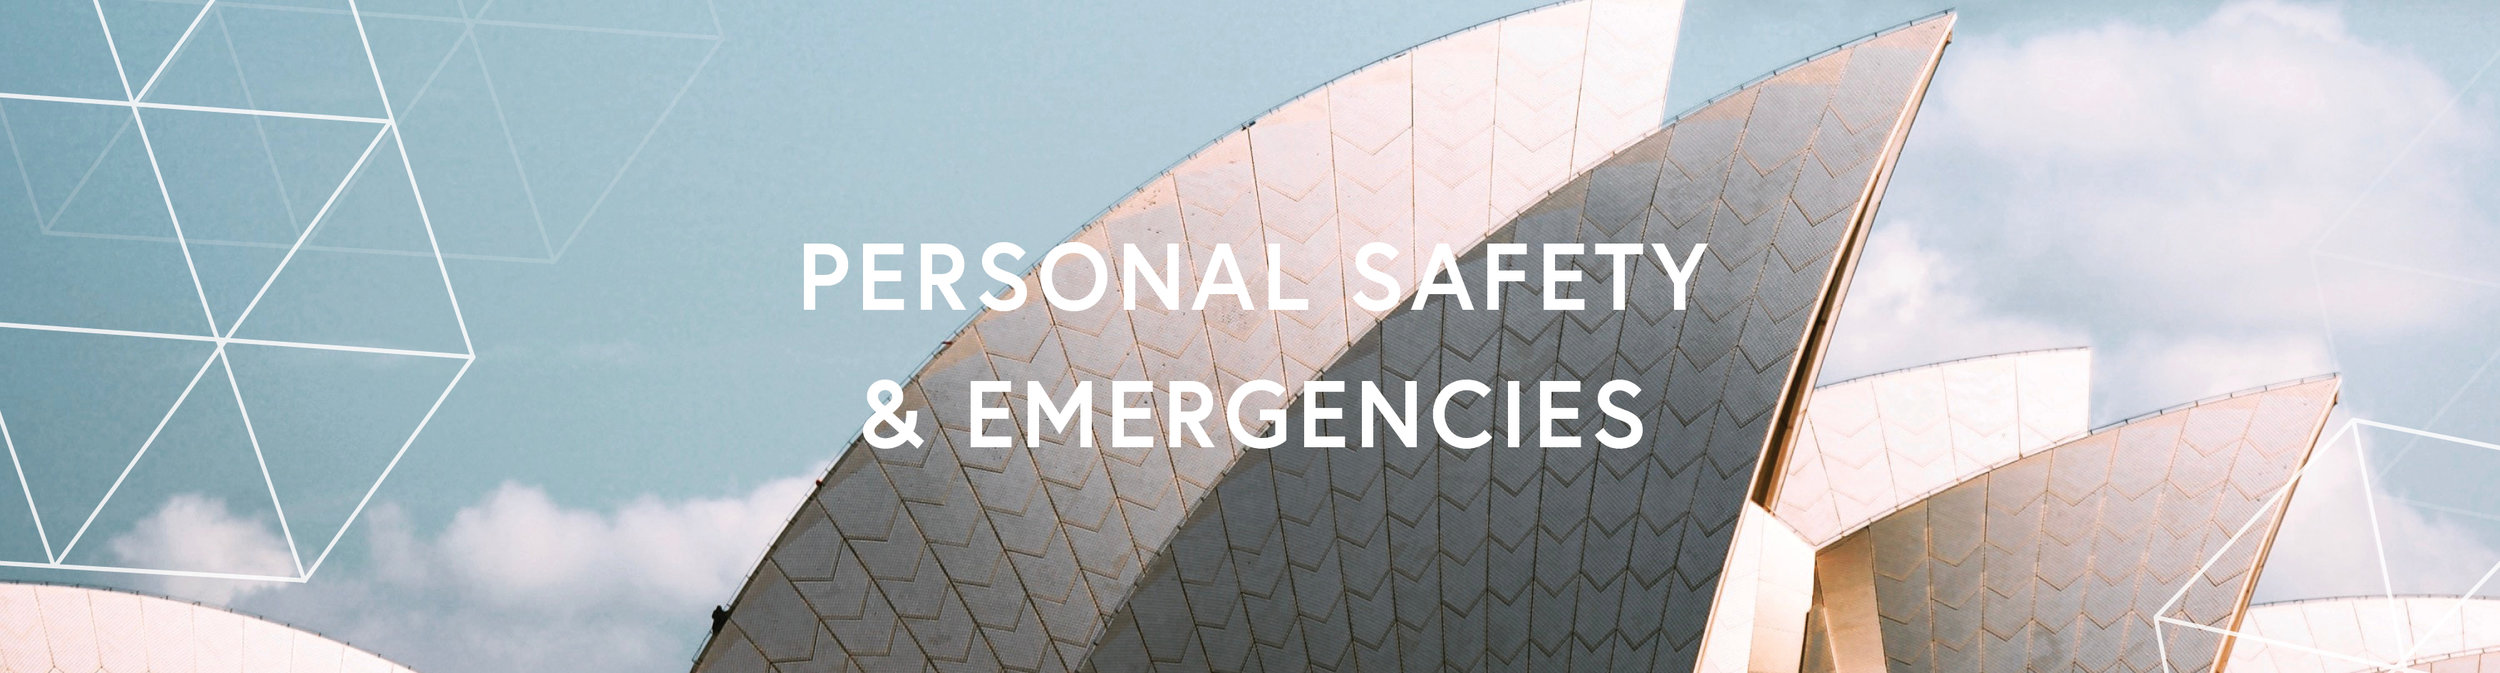 ACBI Personal Safety & Emergencies